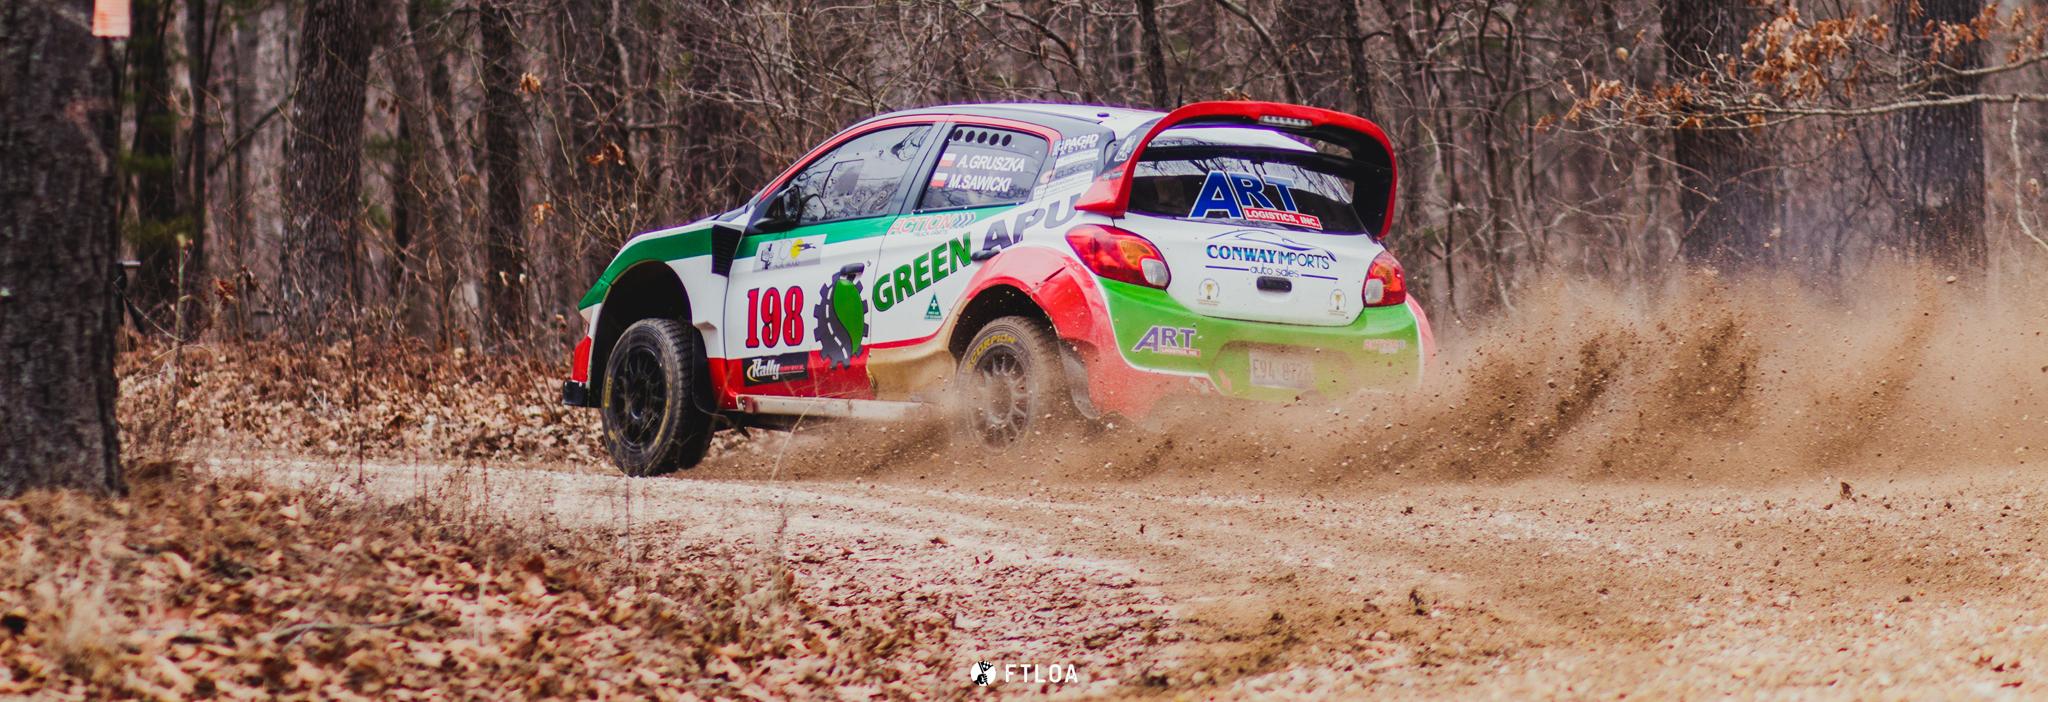 rallyinthe100acrewood-37.jpg